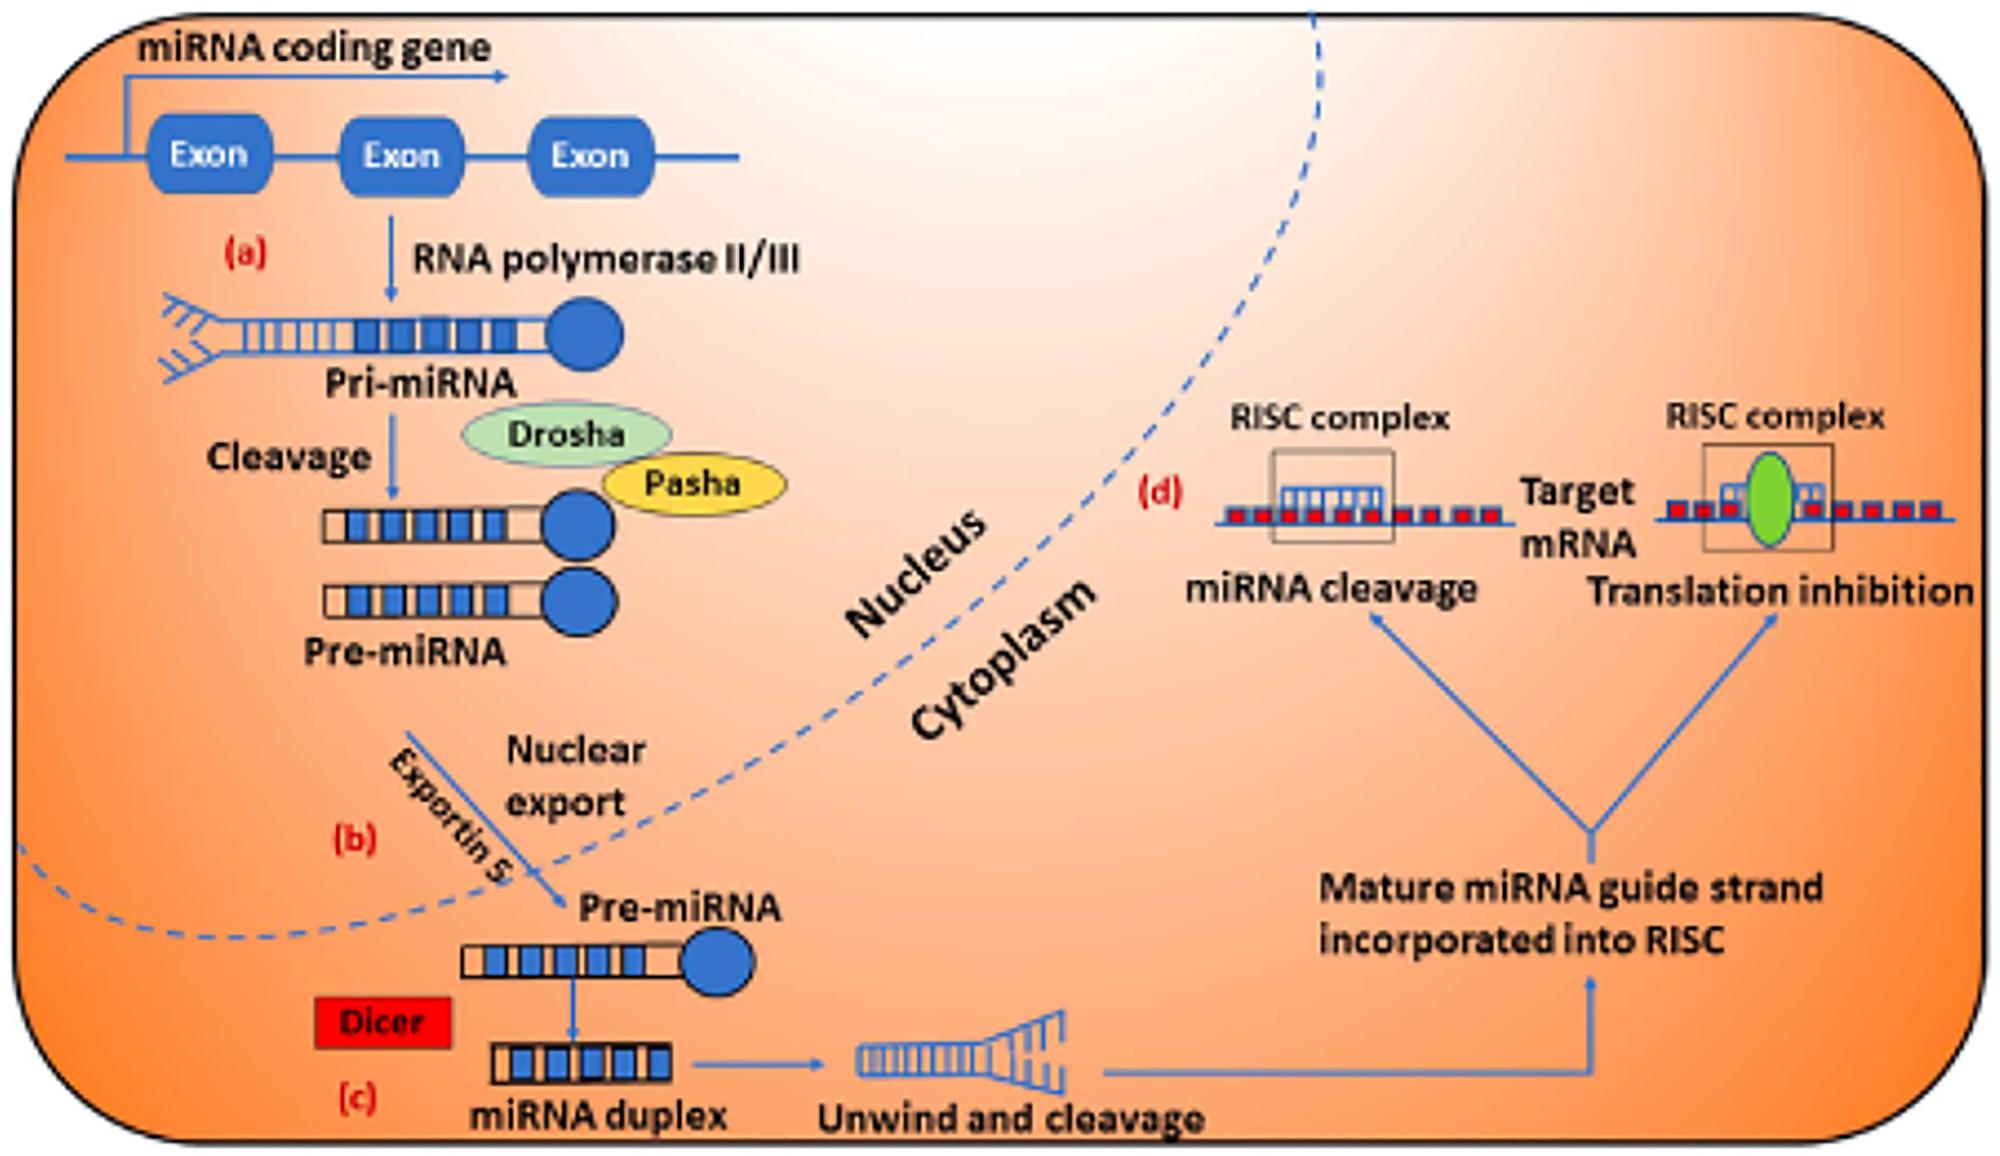 Biogenesis and clinical implications of microRNAs (miRNAs).